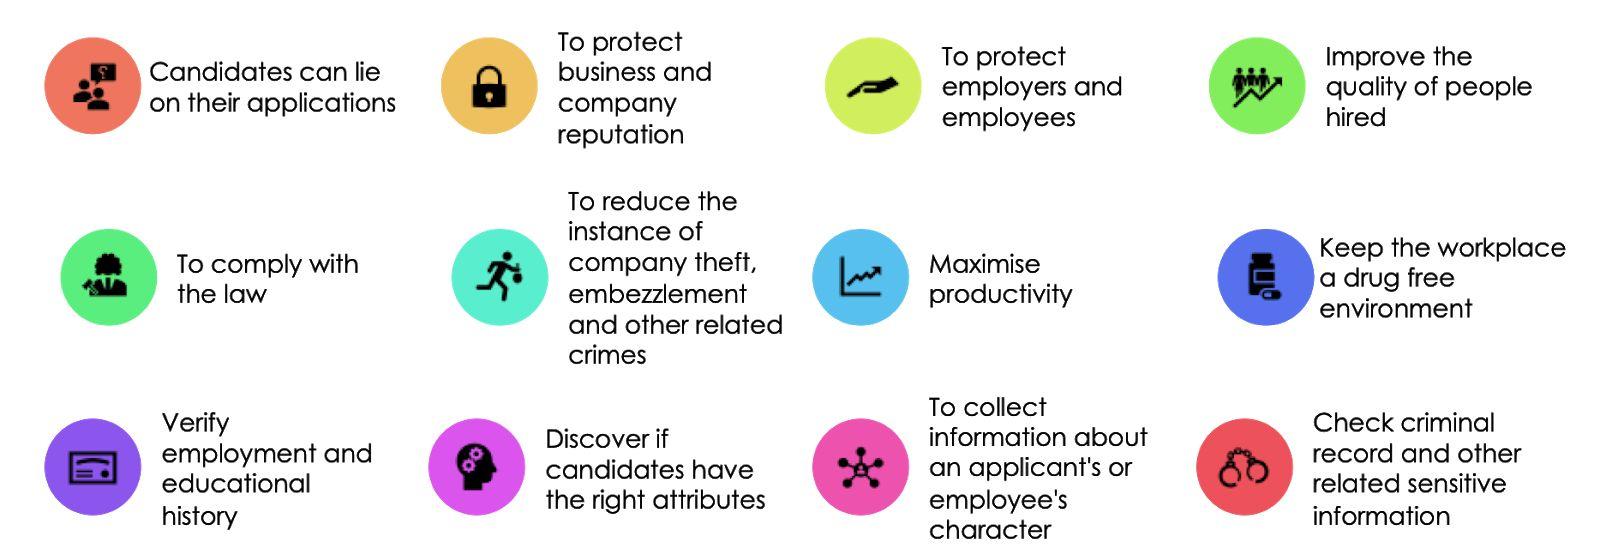 Why Do Employee Background Checks Happen